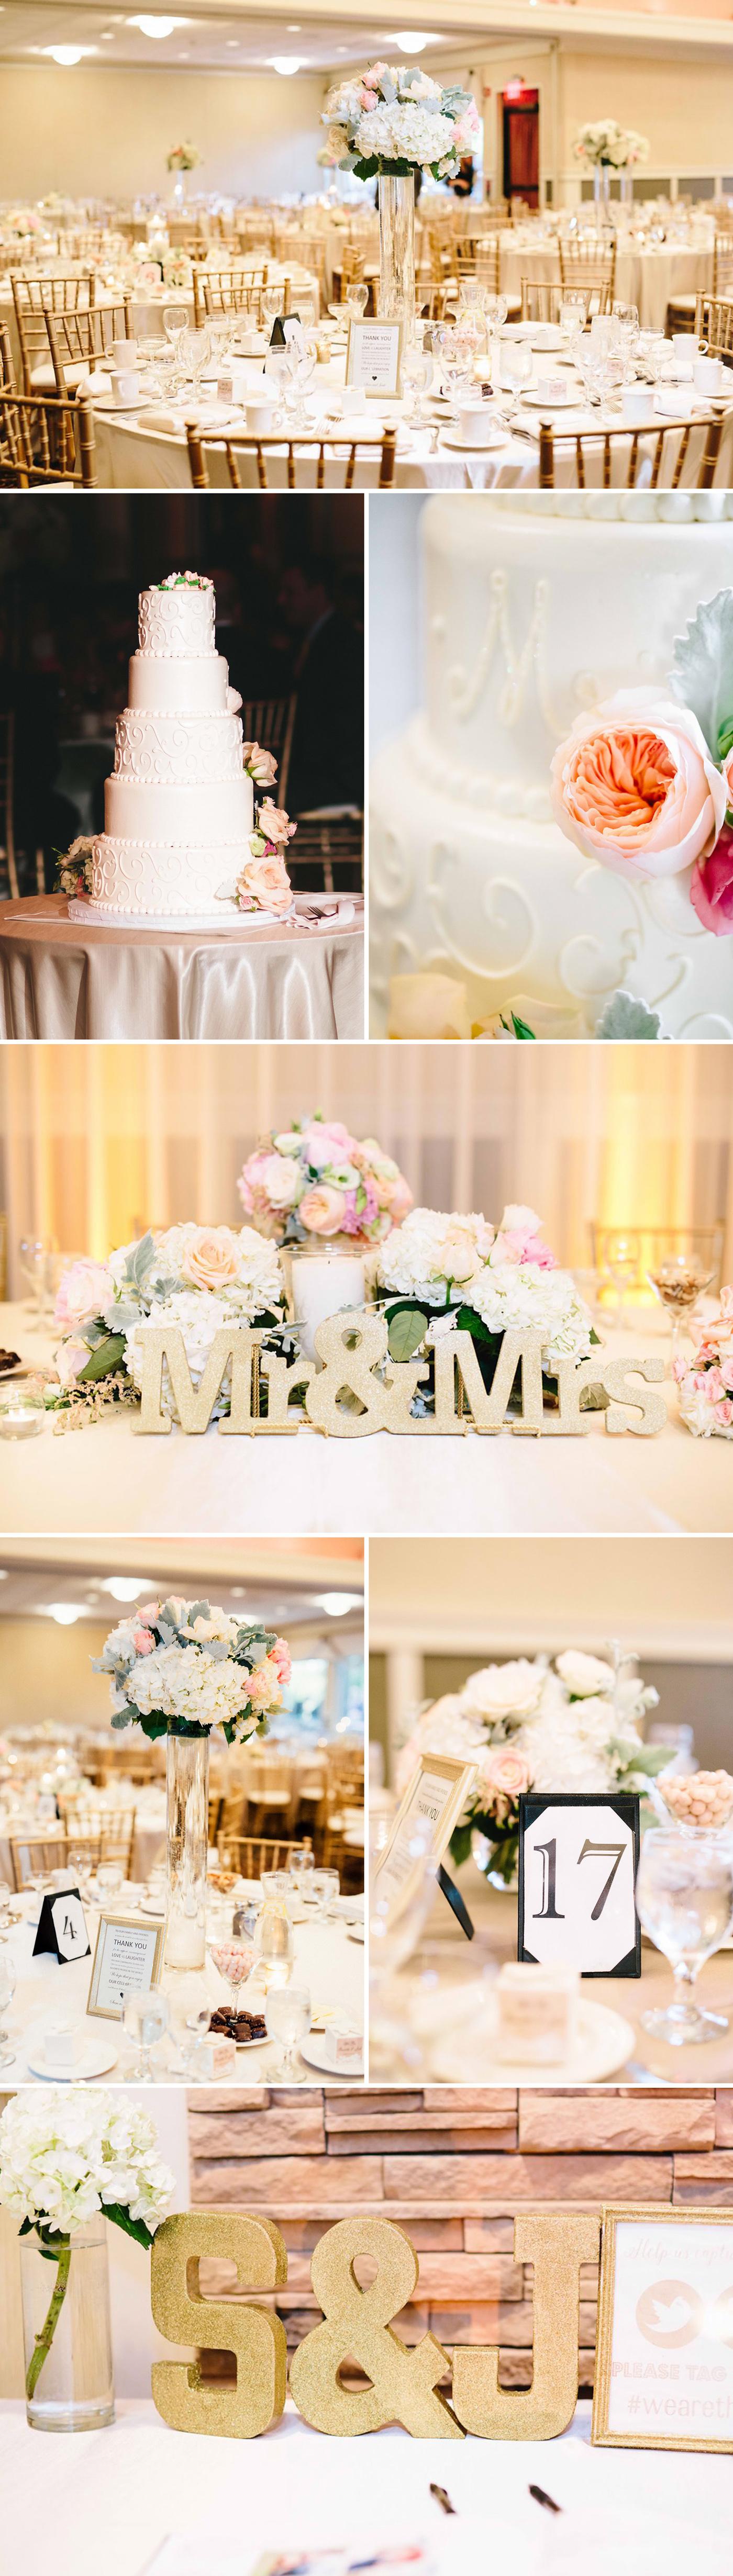 chicago-fine-art-wedding-photography-marshall5